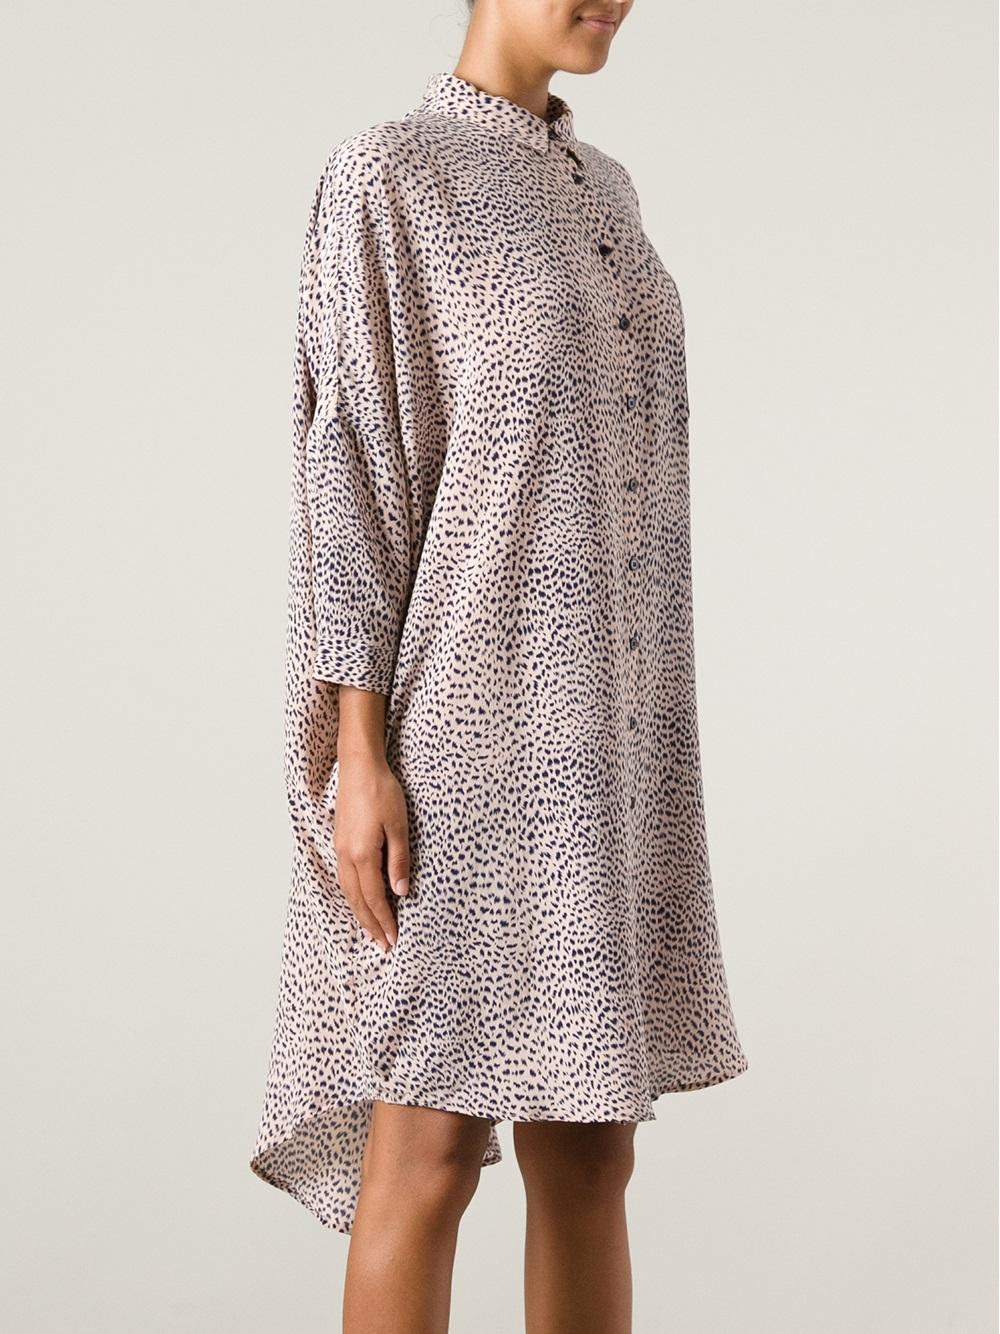 lyst kokoon oversized silk shirt dress in natural